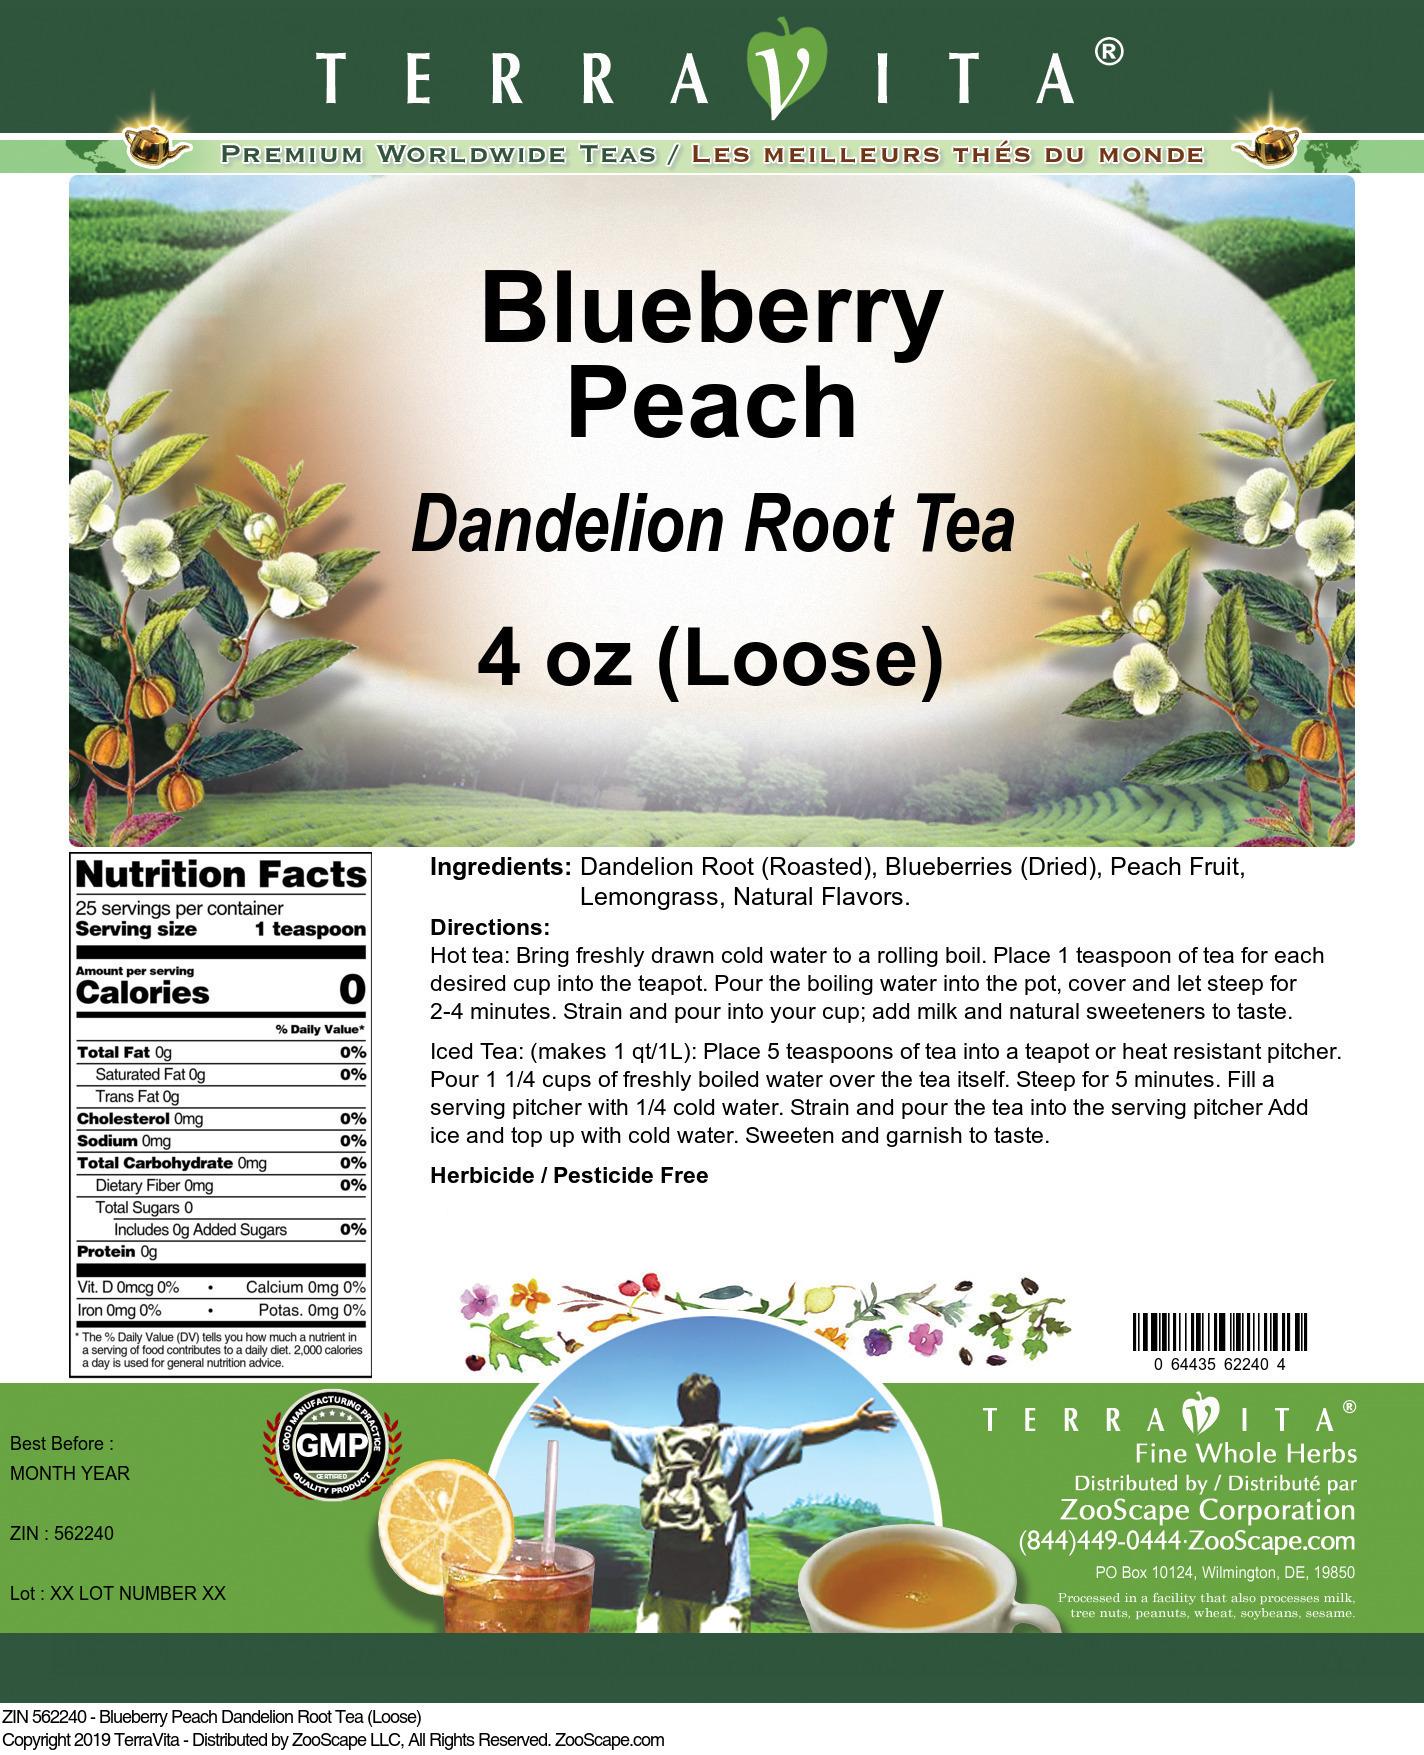 Blueberry Peach Dandelion Root Tea (Loose)